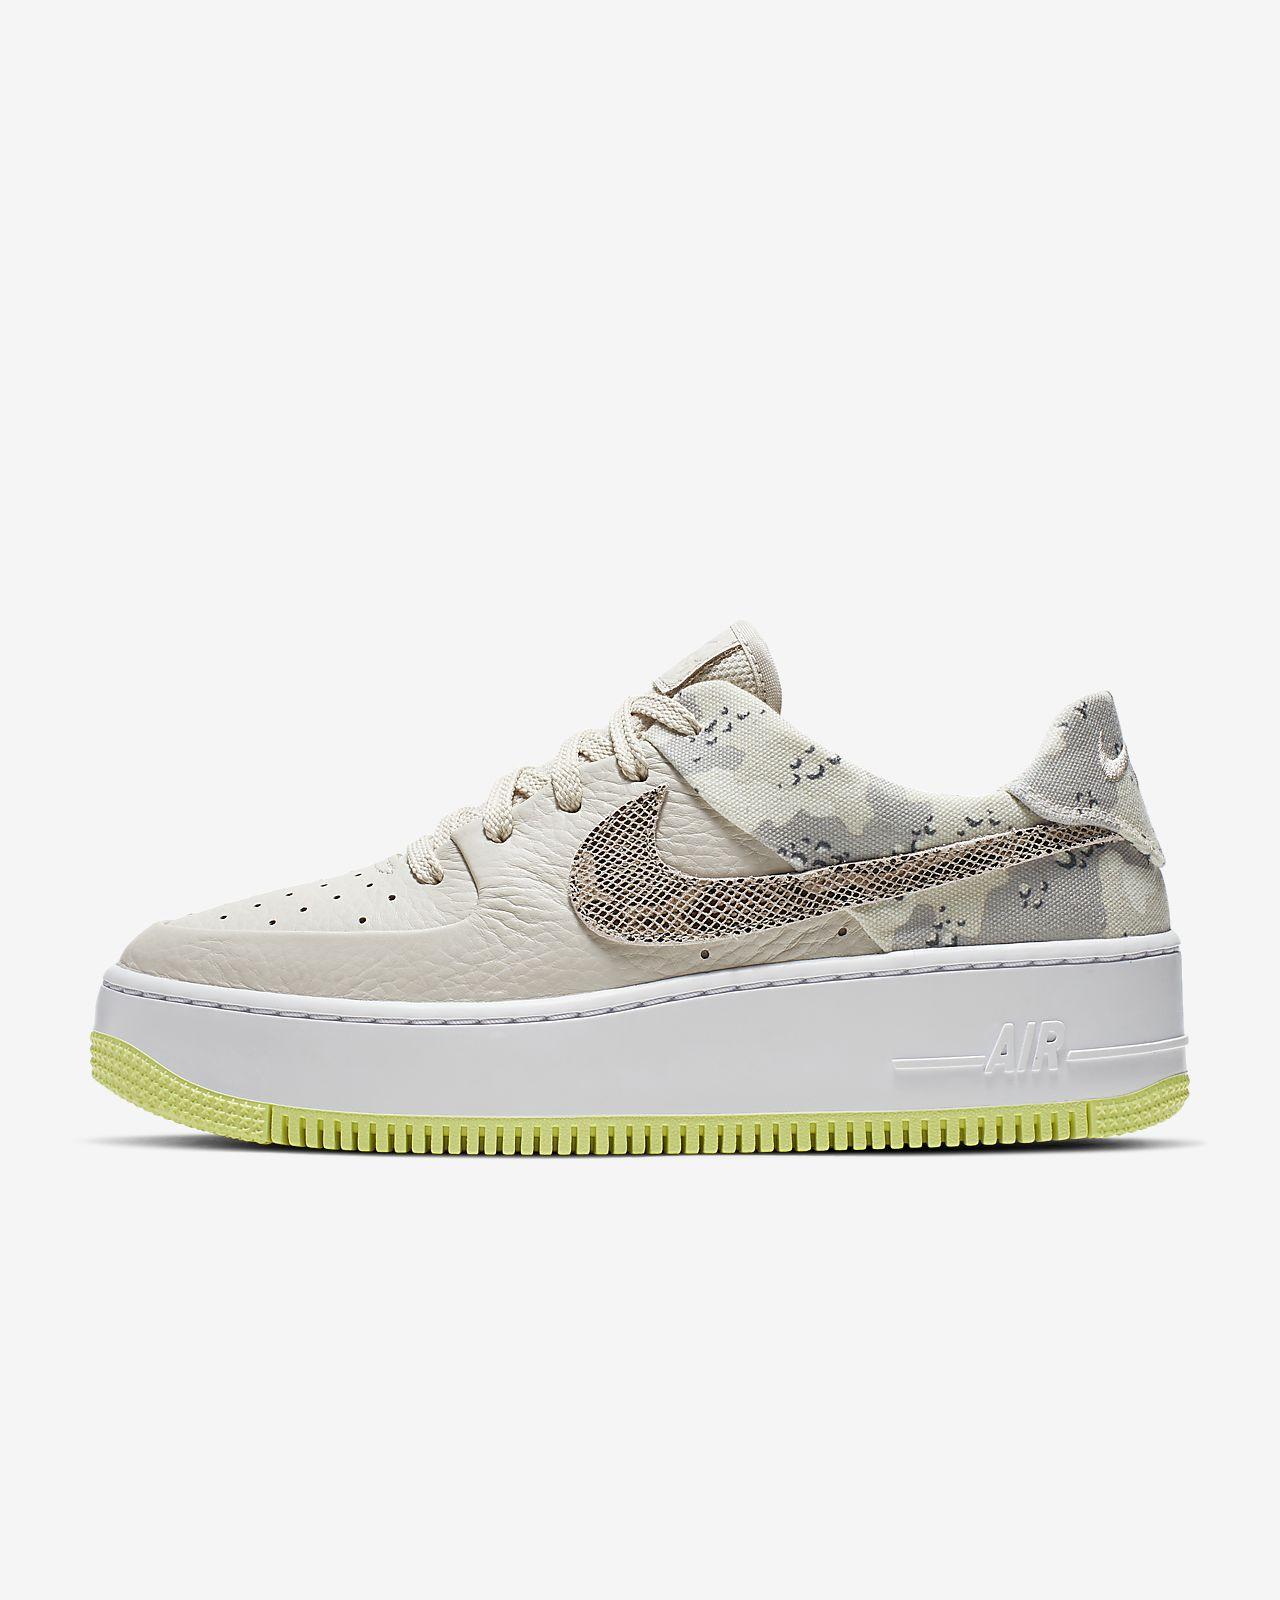 competitive price b018a 2110f Nike Air Force 1 Sage Low Premium Camo-sko til kvinder. Nike.com DK